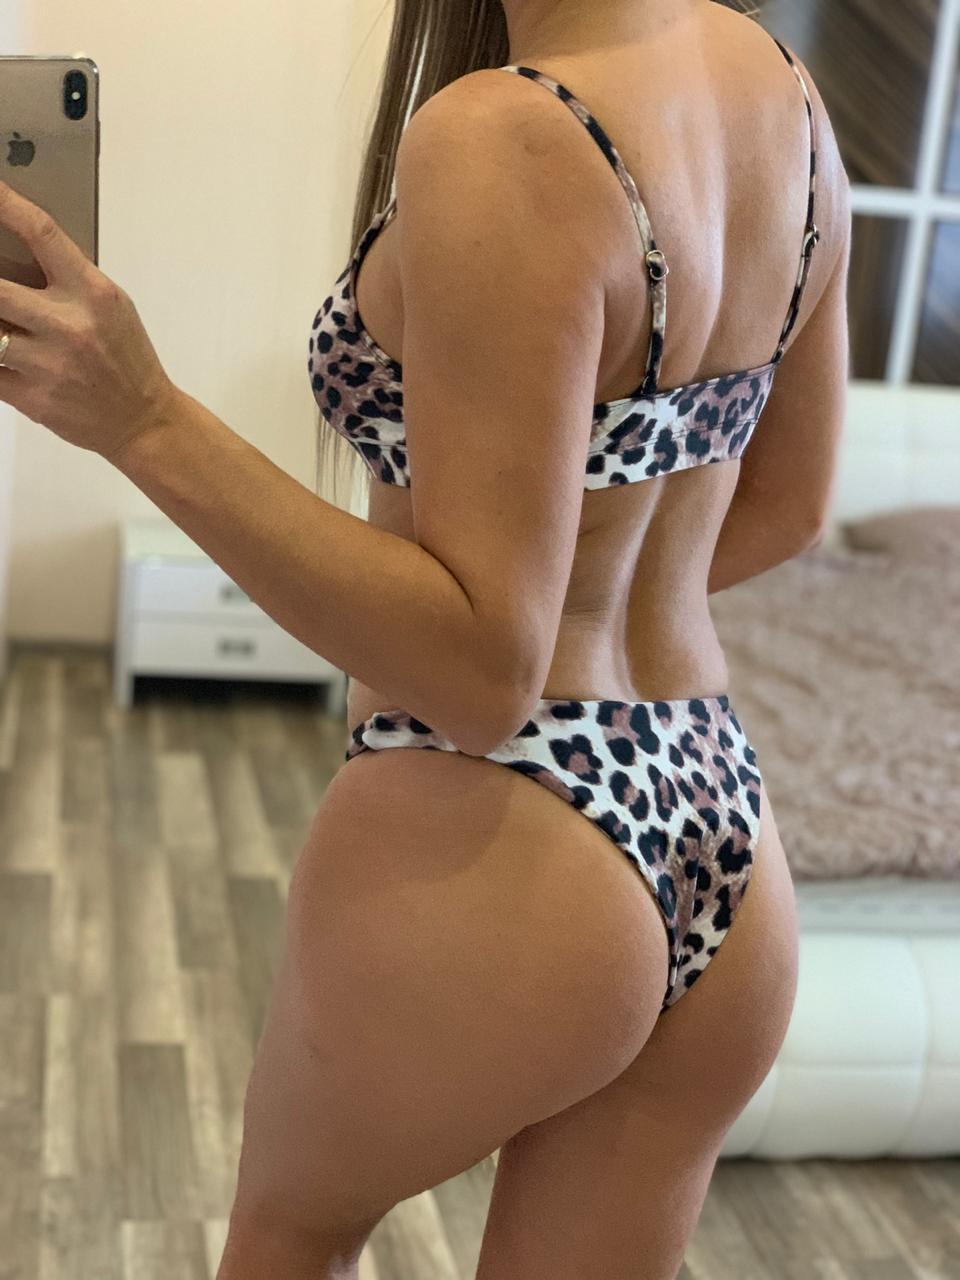 HTB1OvN7X2fsK1RjSszgq6yXzpXaR 6 Colors Sexy Leopard 2019 Bikini Women Swimwear Female Swimsuit Two-pieces Bikini set Brazilian Bather Bathing Suit Swim V871